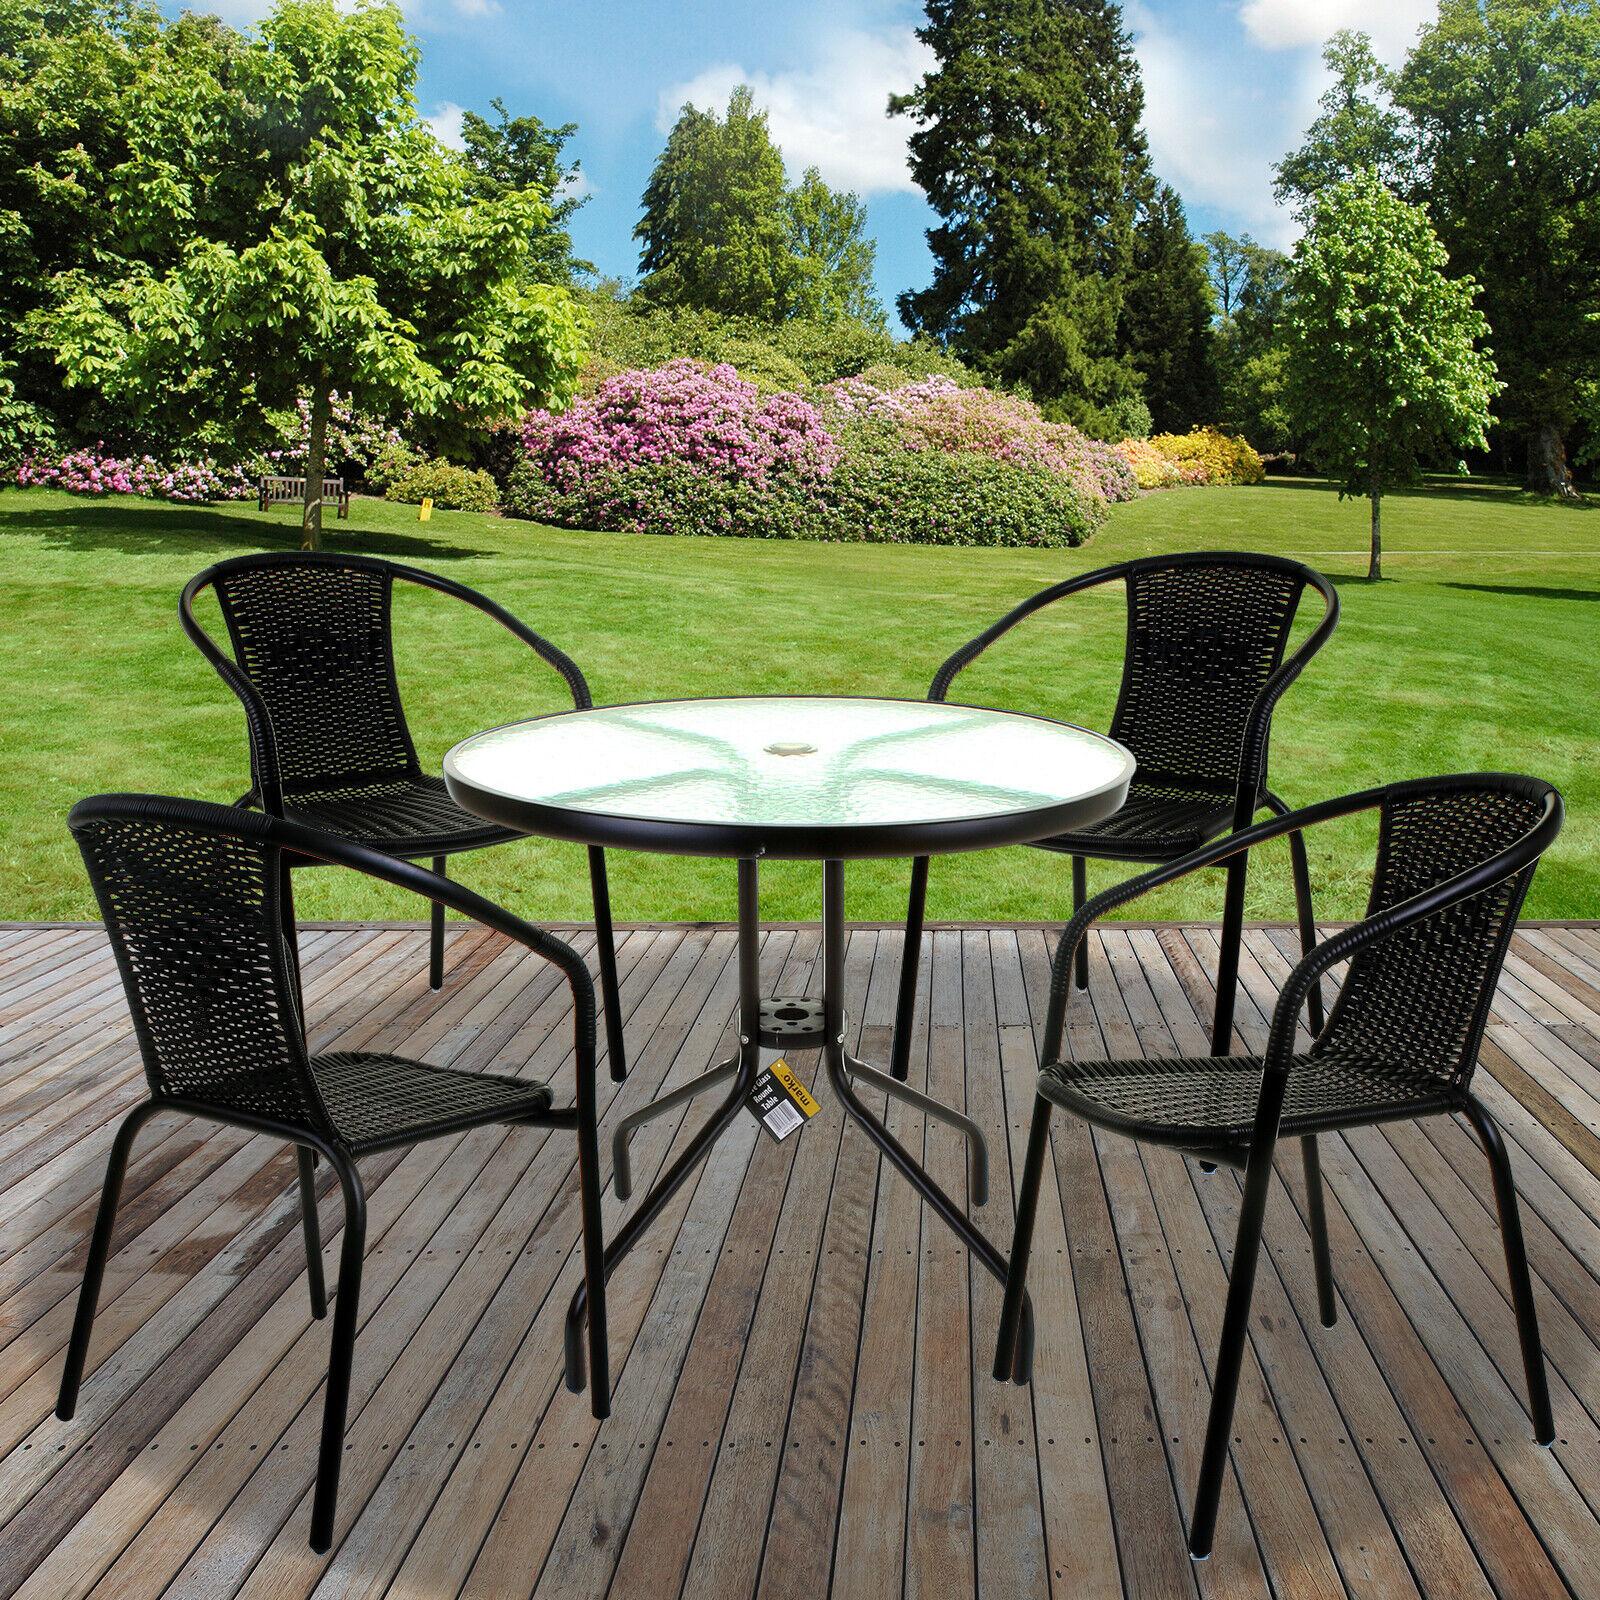 Garden Furniture - Black Wicker Bistro Sets Table  Patio Garden Outdoor Furniture Diner Home